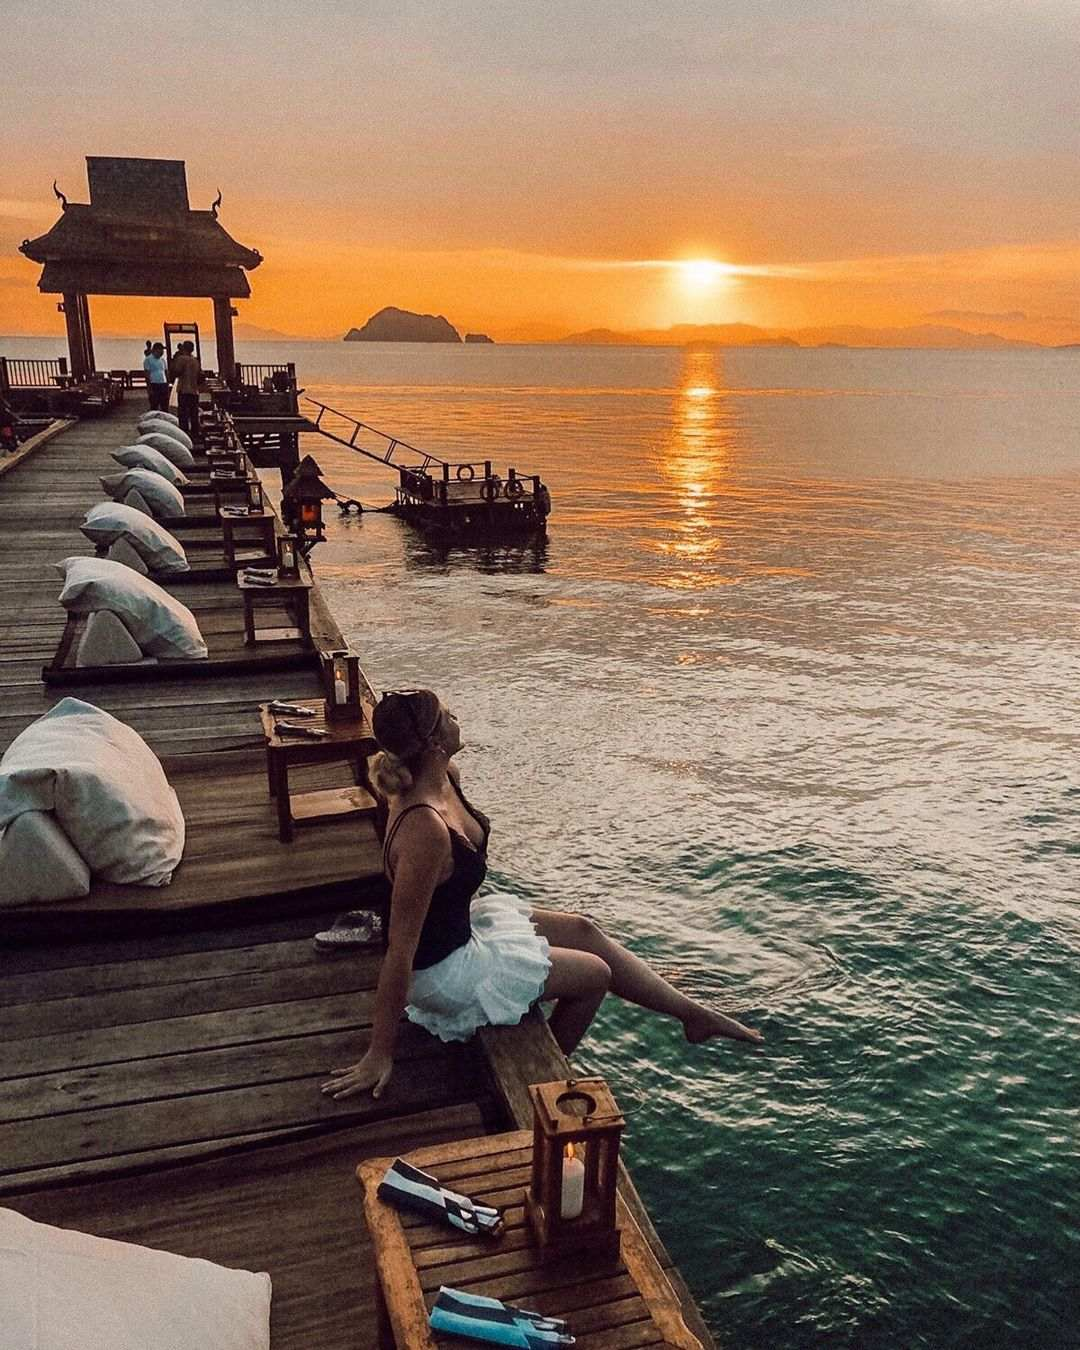 Girl sitting at the Jetinn Teppan Pier on Koh Yao Yai